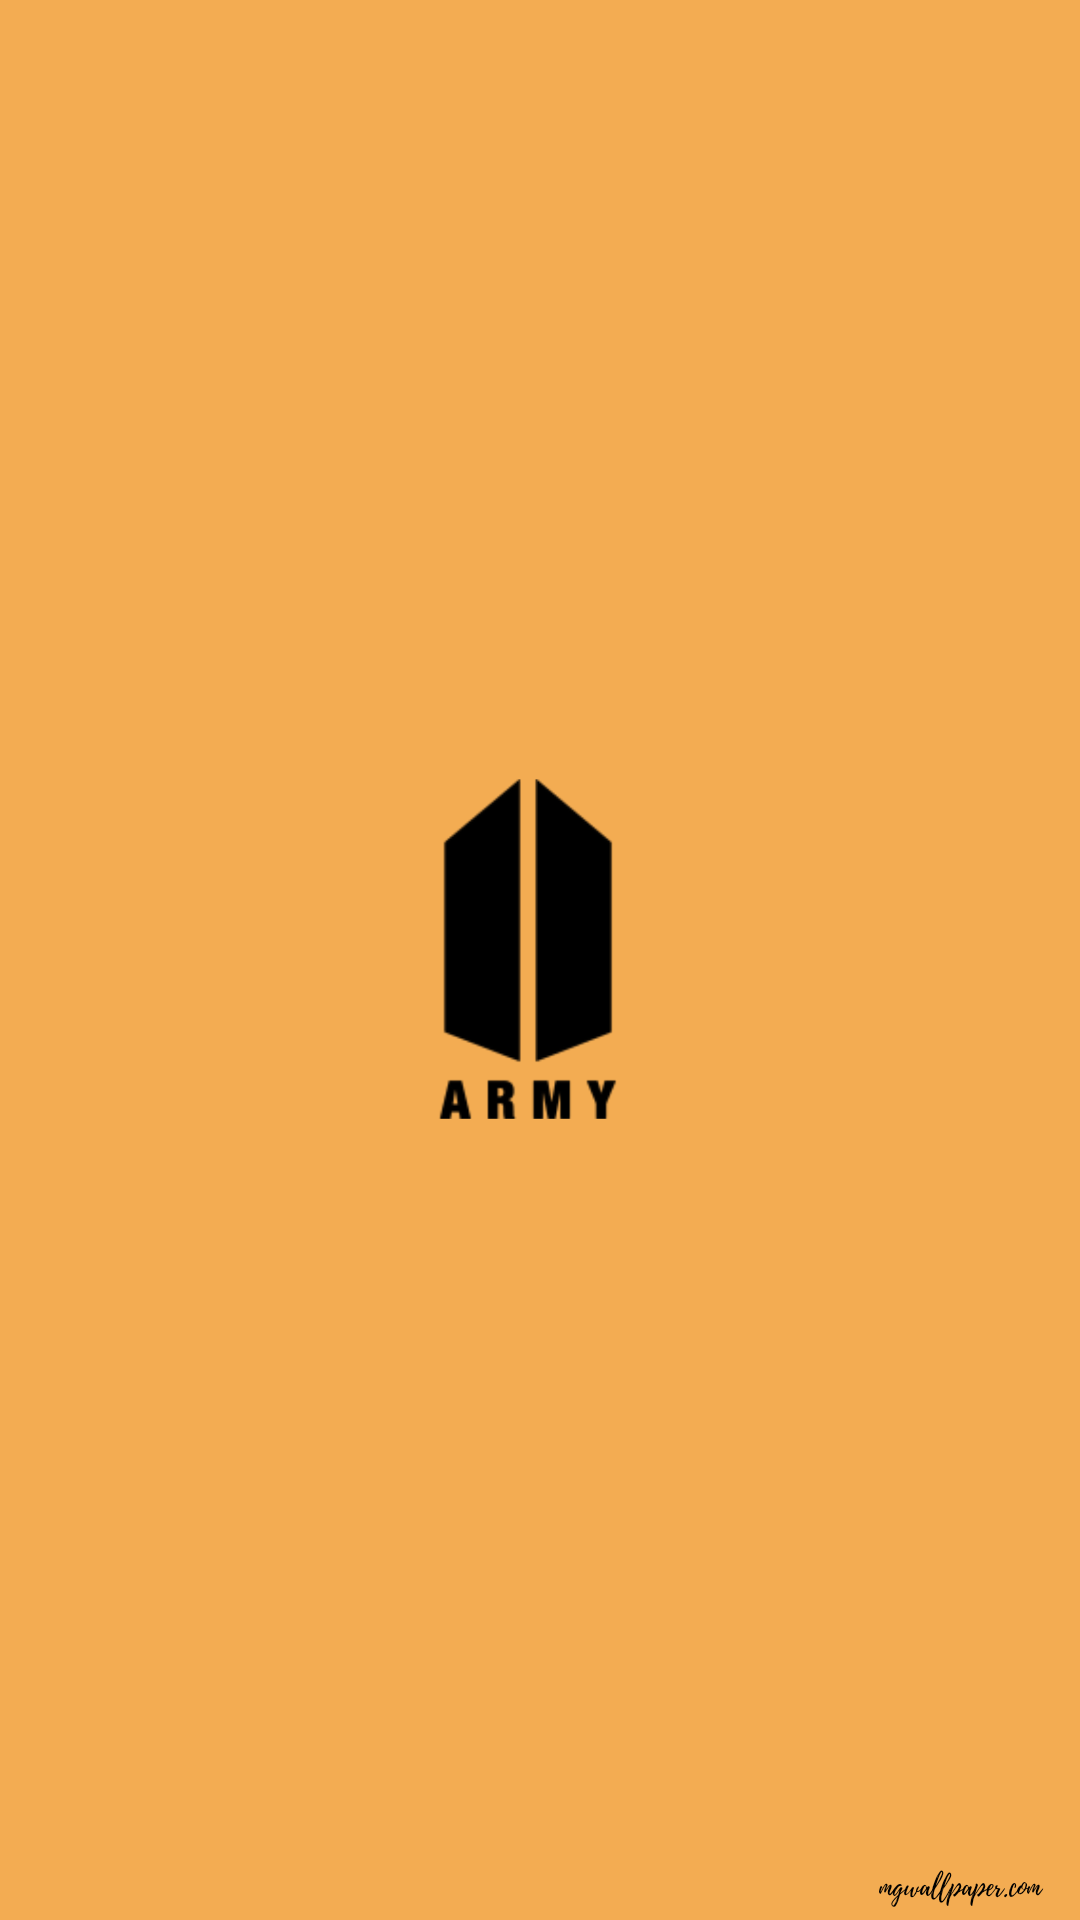 Download Wallpaper Army BTS Wallpaper HD Free